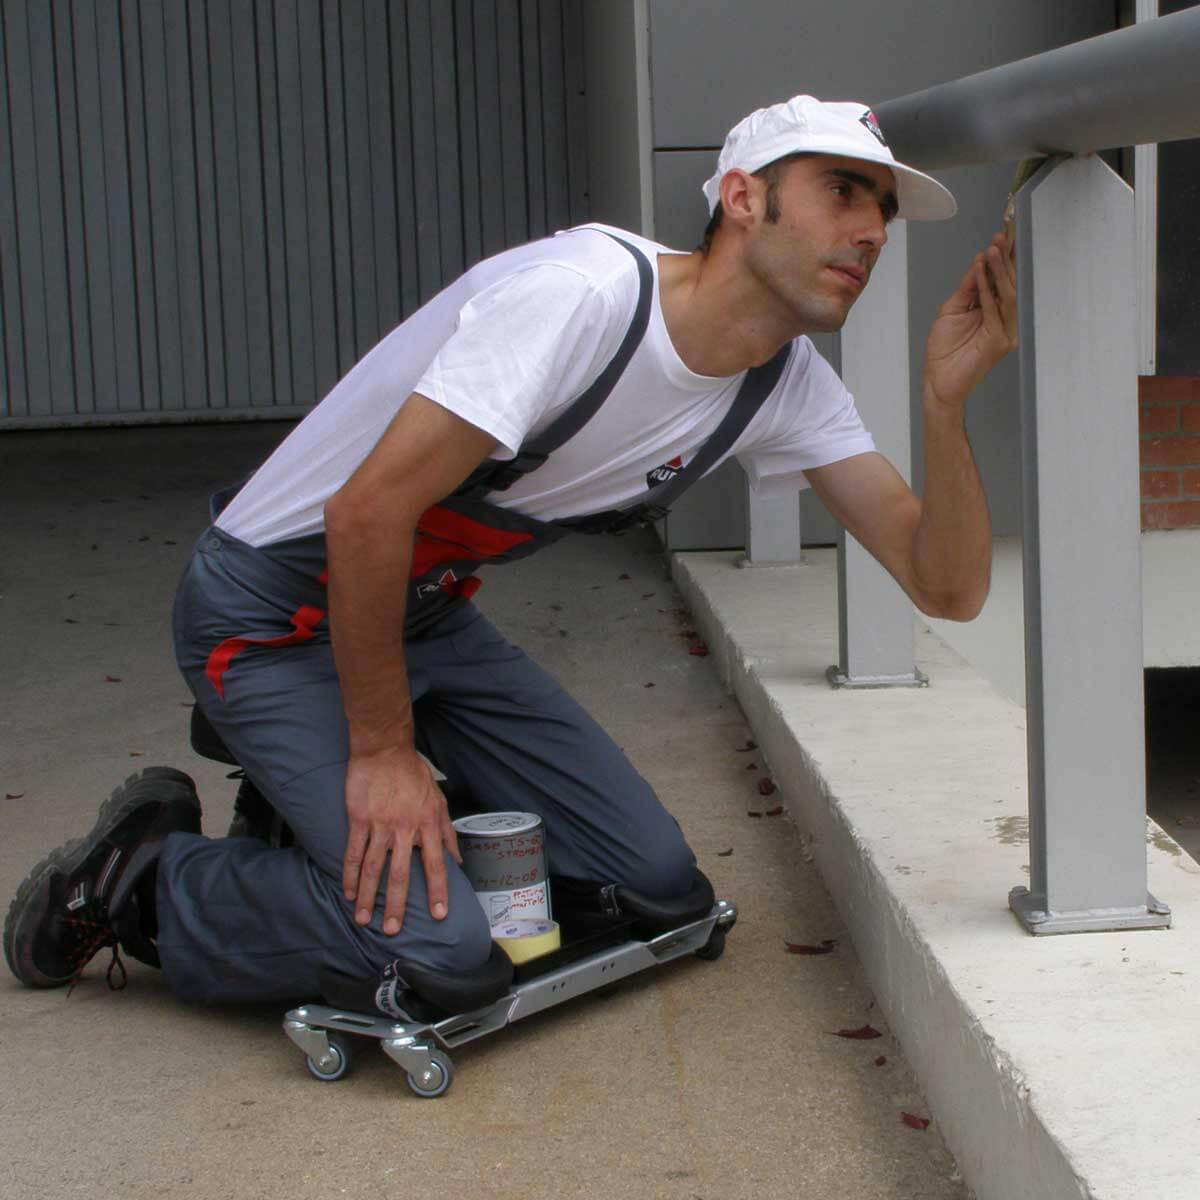 Rubi SR1 Ergonomic Knee Pad painter